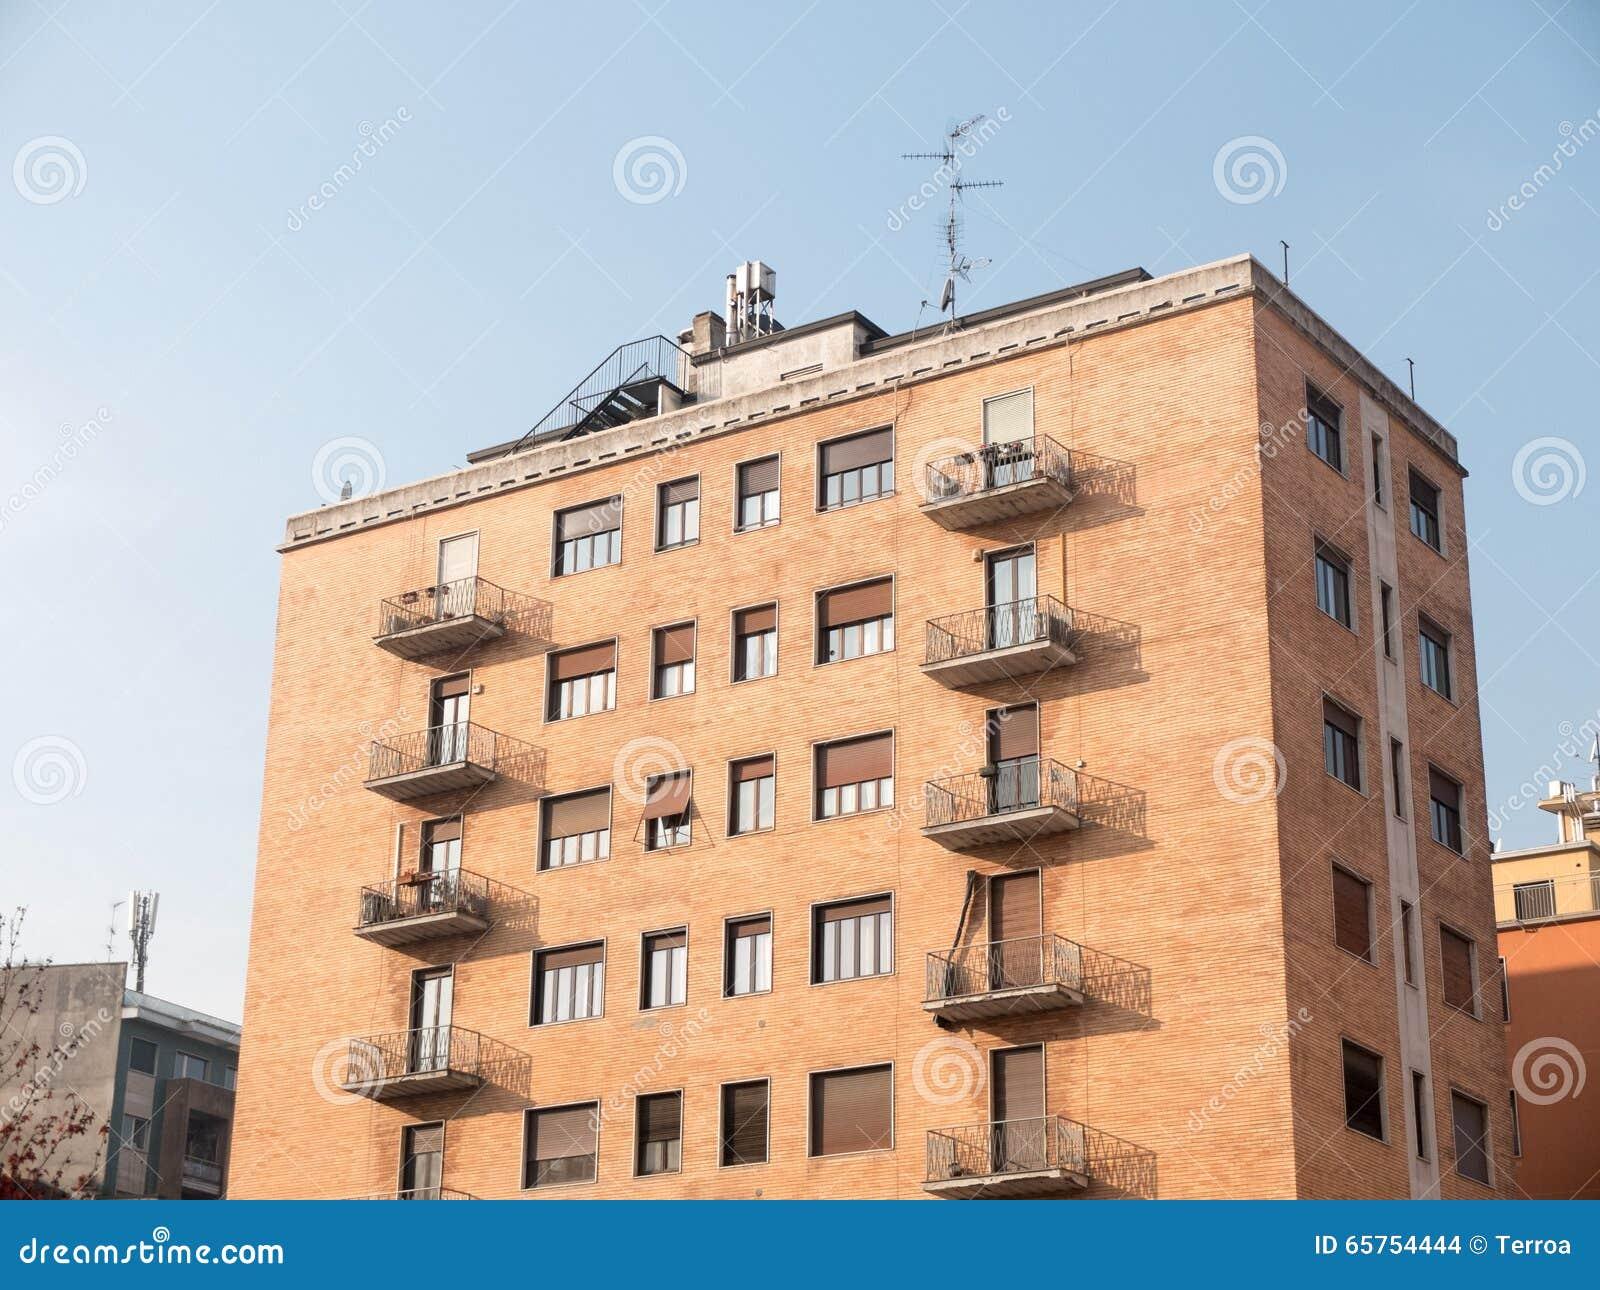 Brick Apartment Building Balcony The Hippest Pics